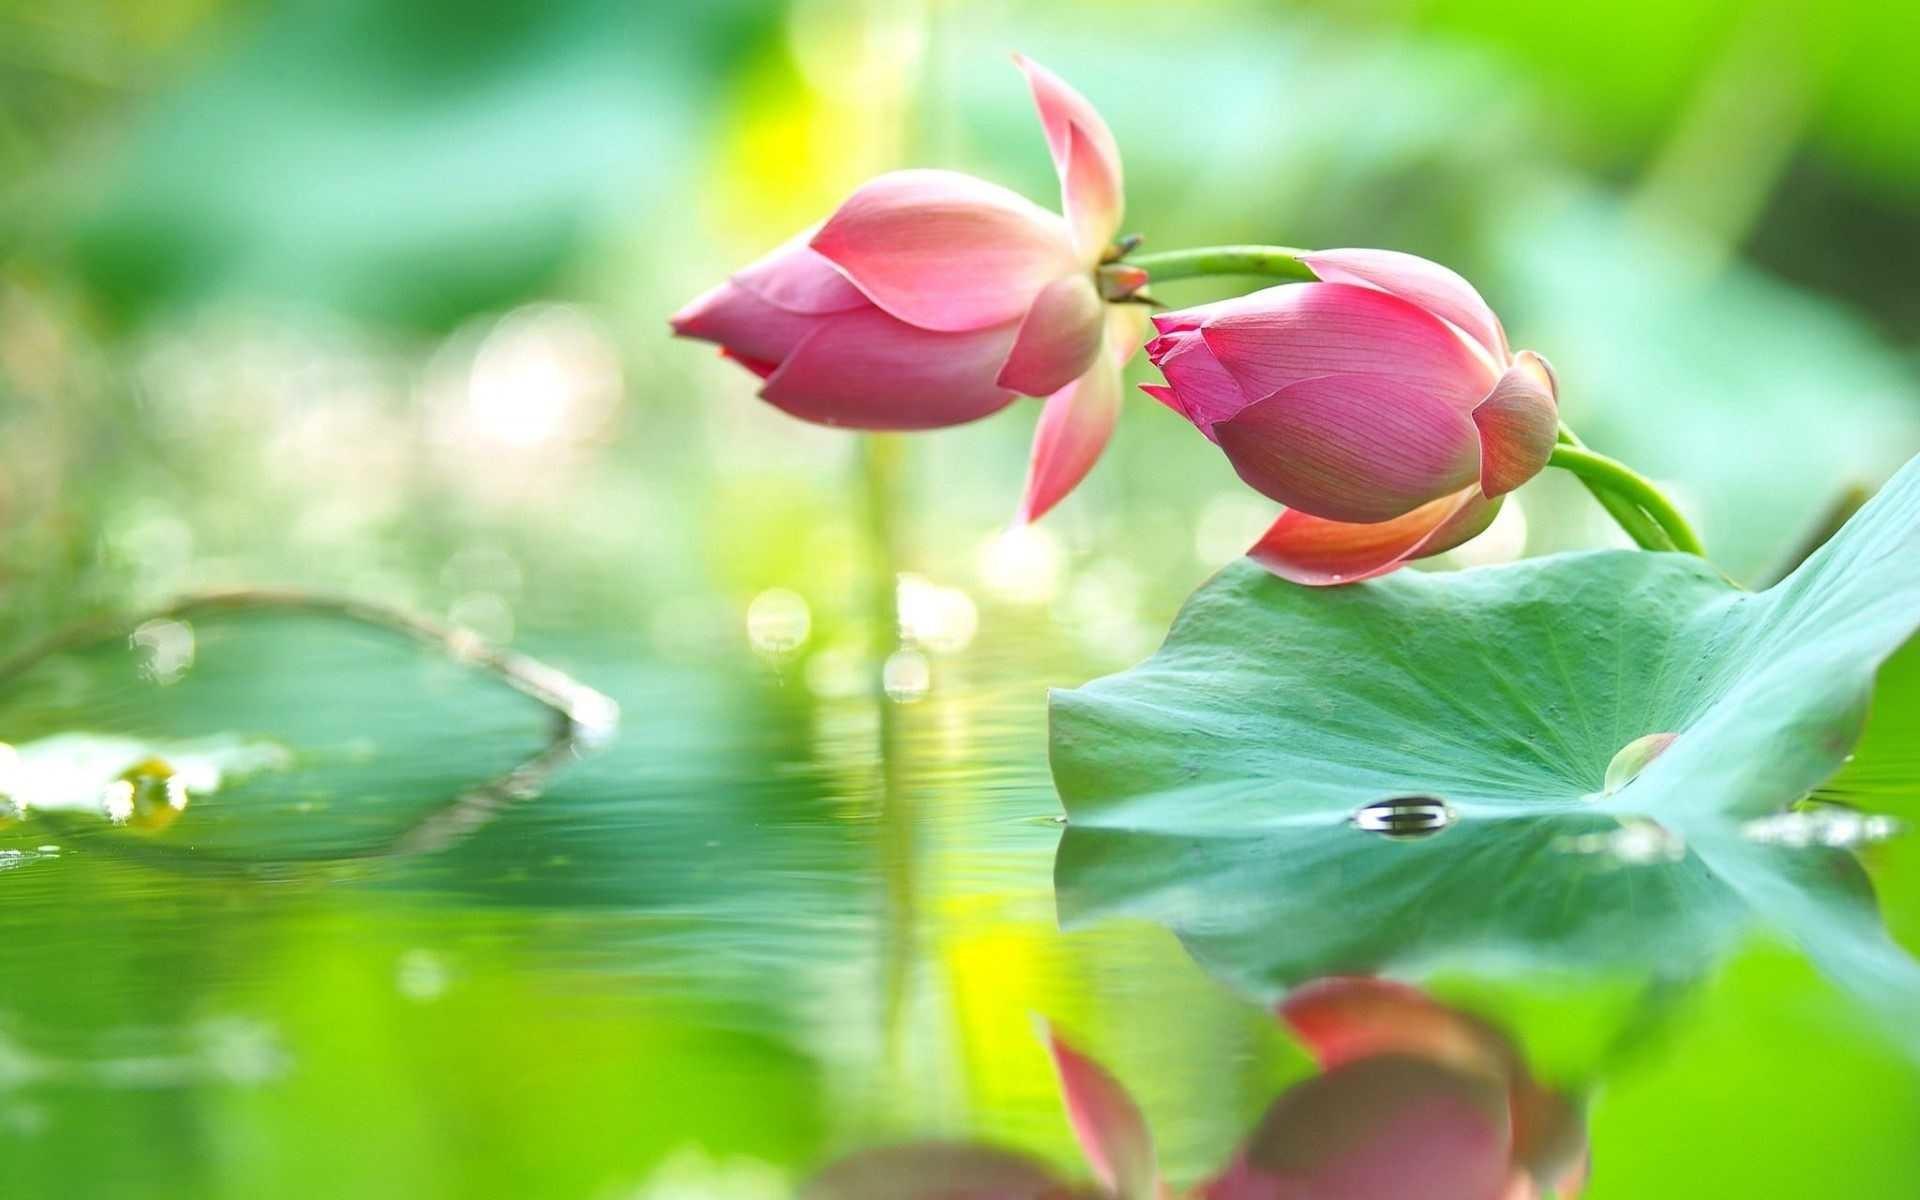 Lotus Flower Wallpaper 72 Images